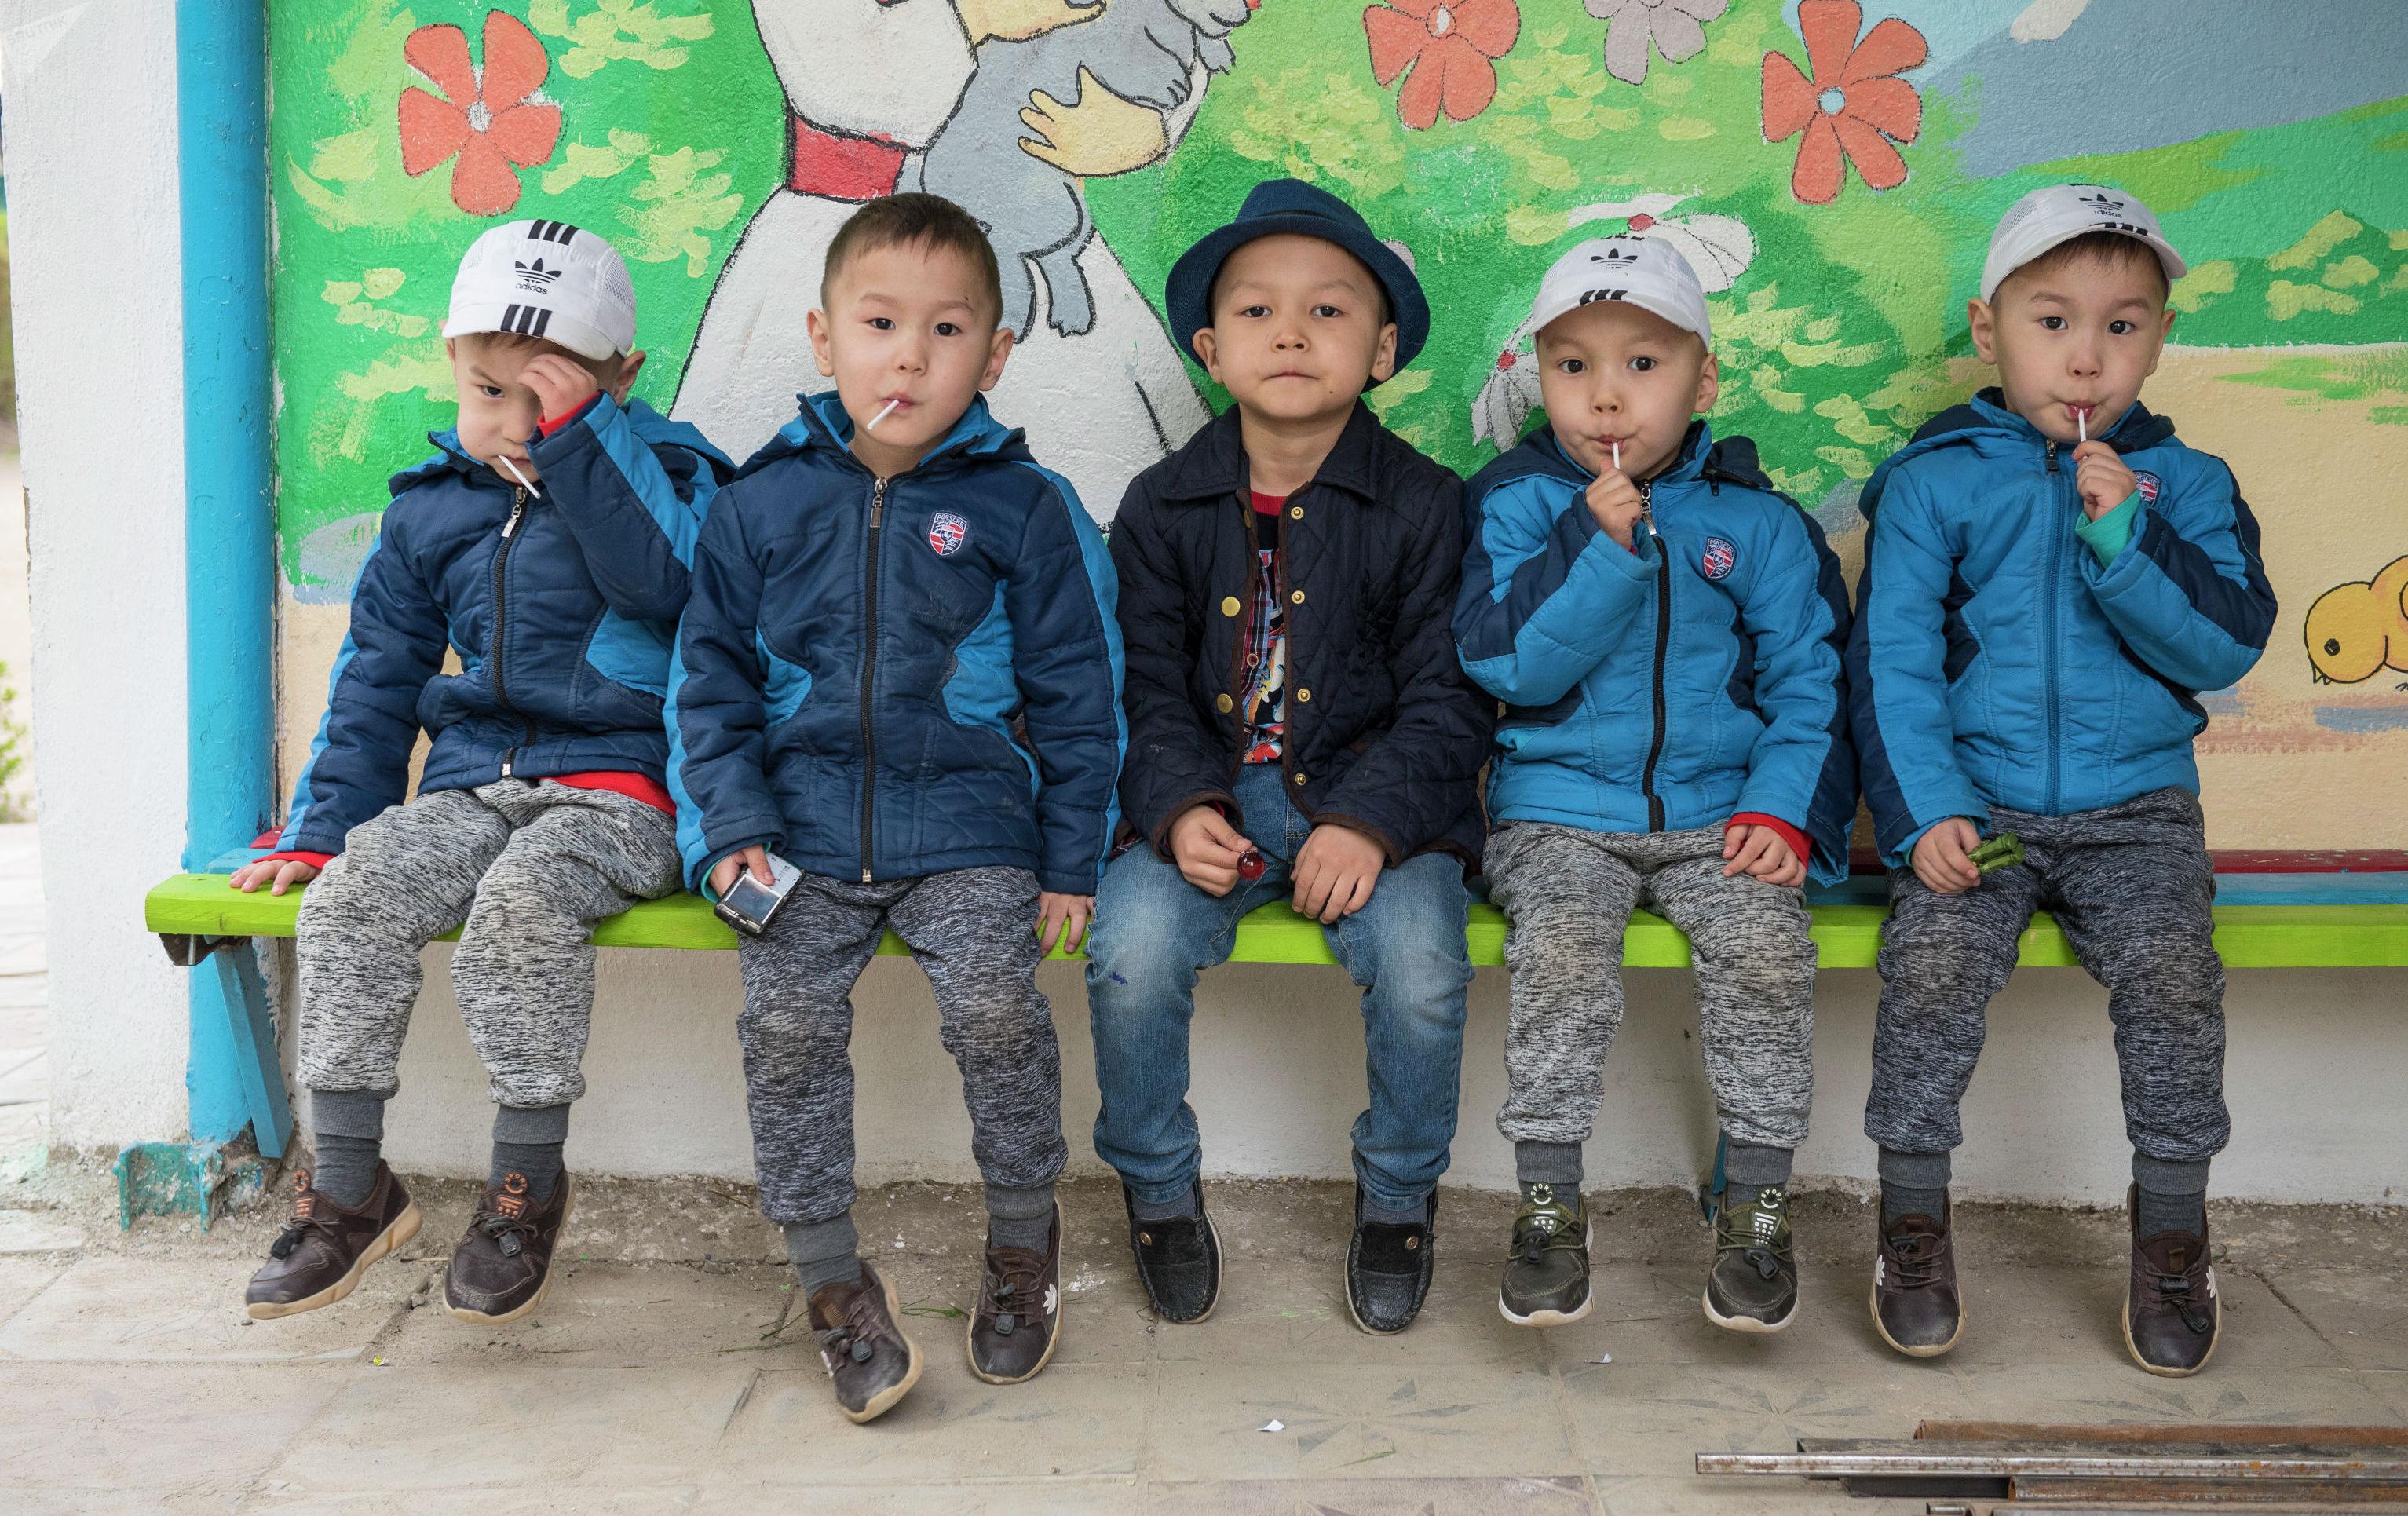 Четверняши Алмазбек, Асылбек, Кубанычбек и Камчыбек с братом